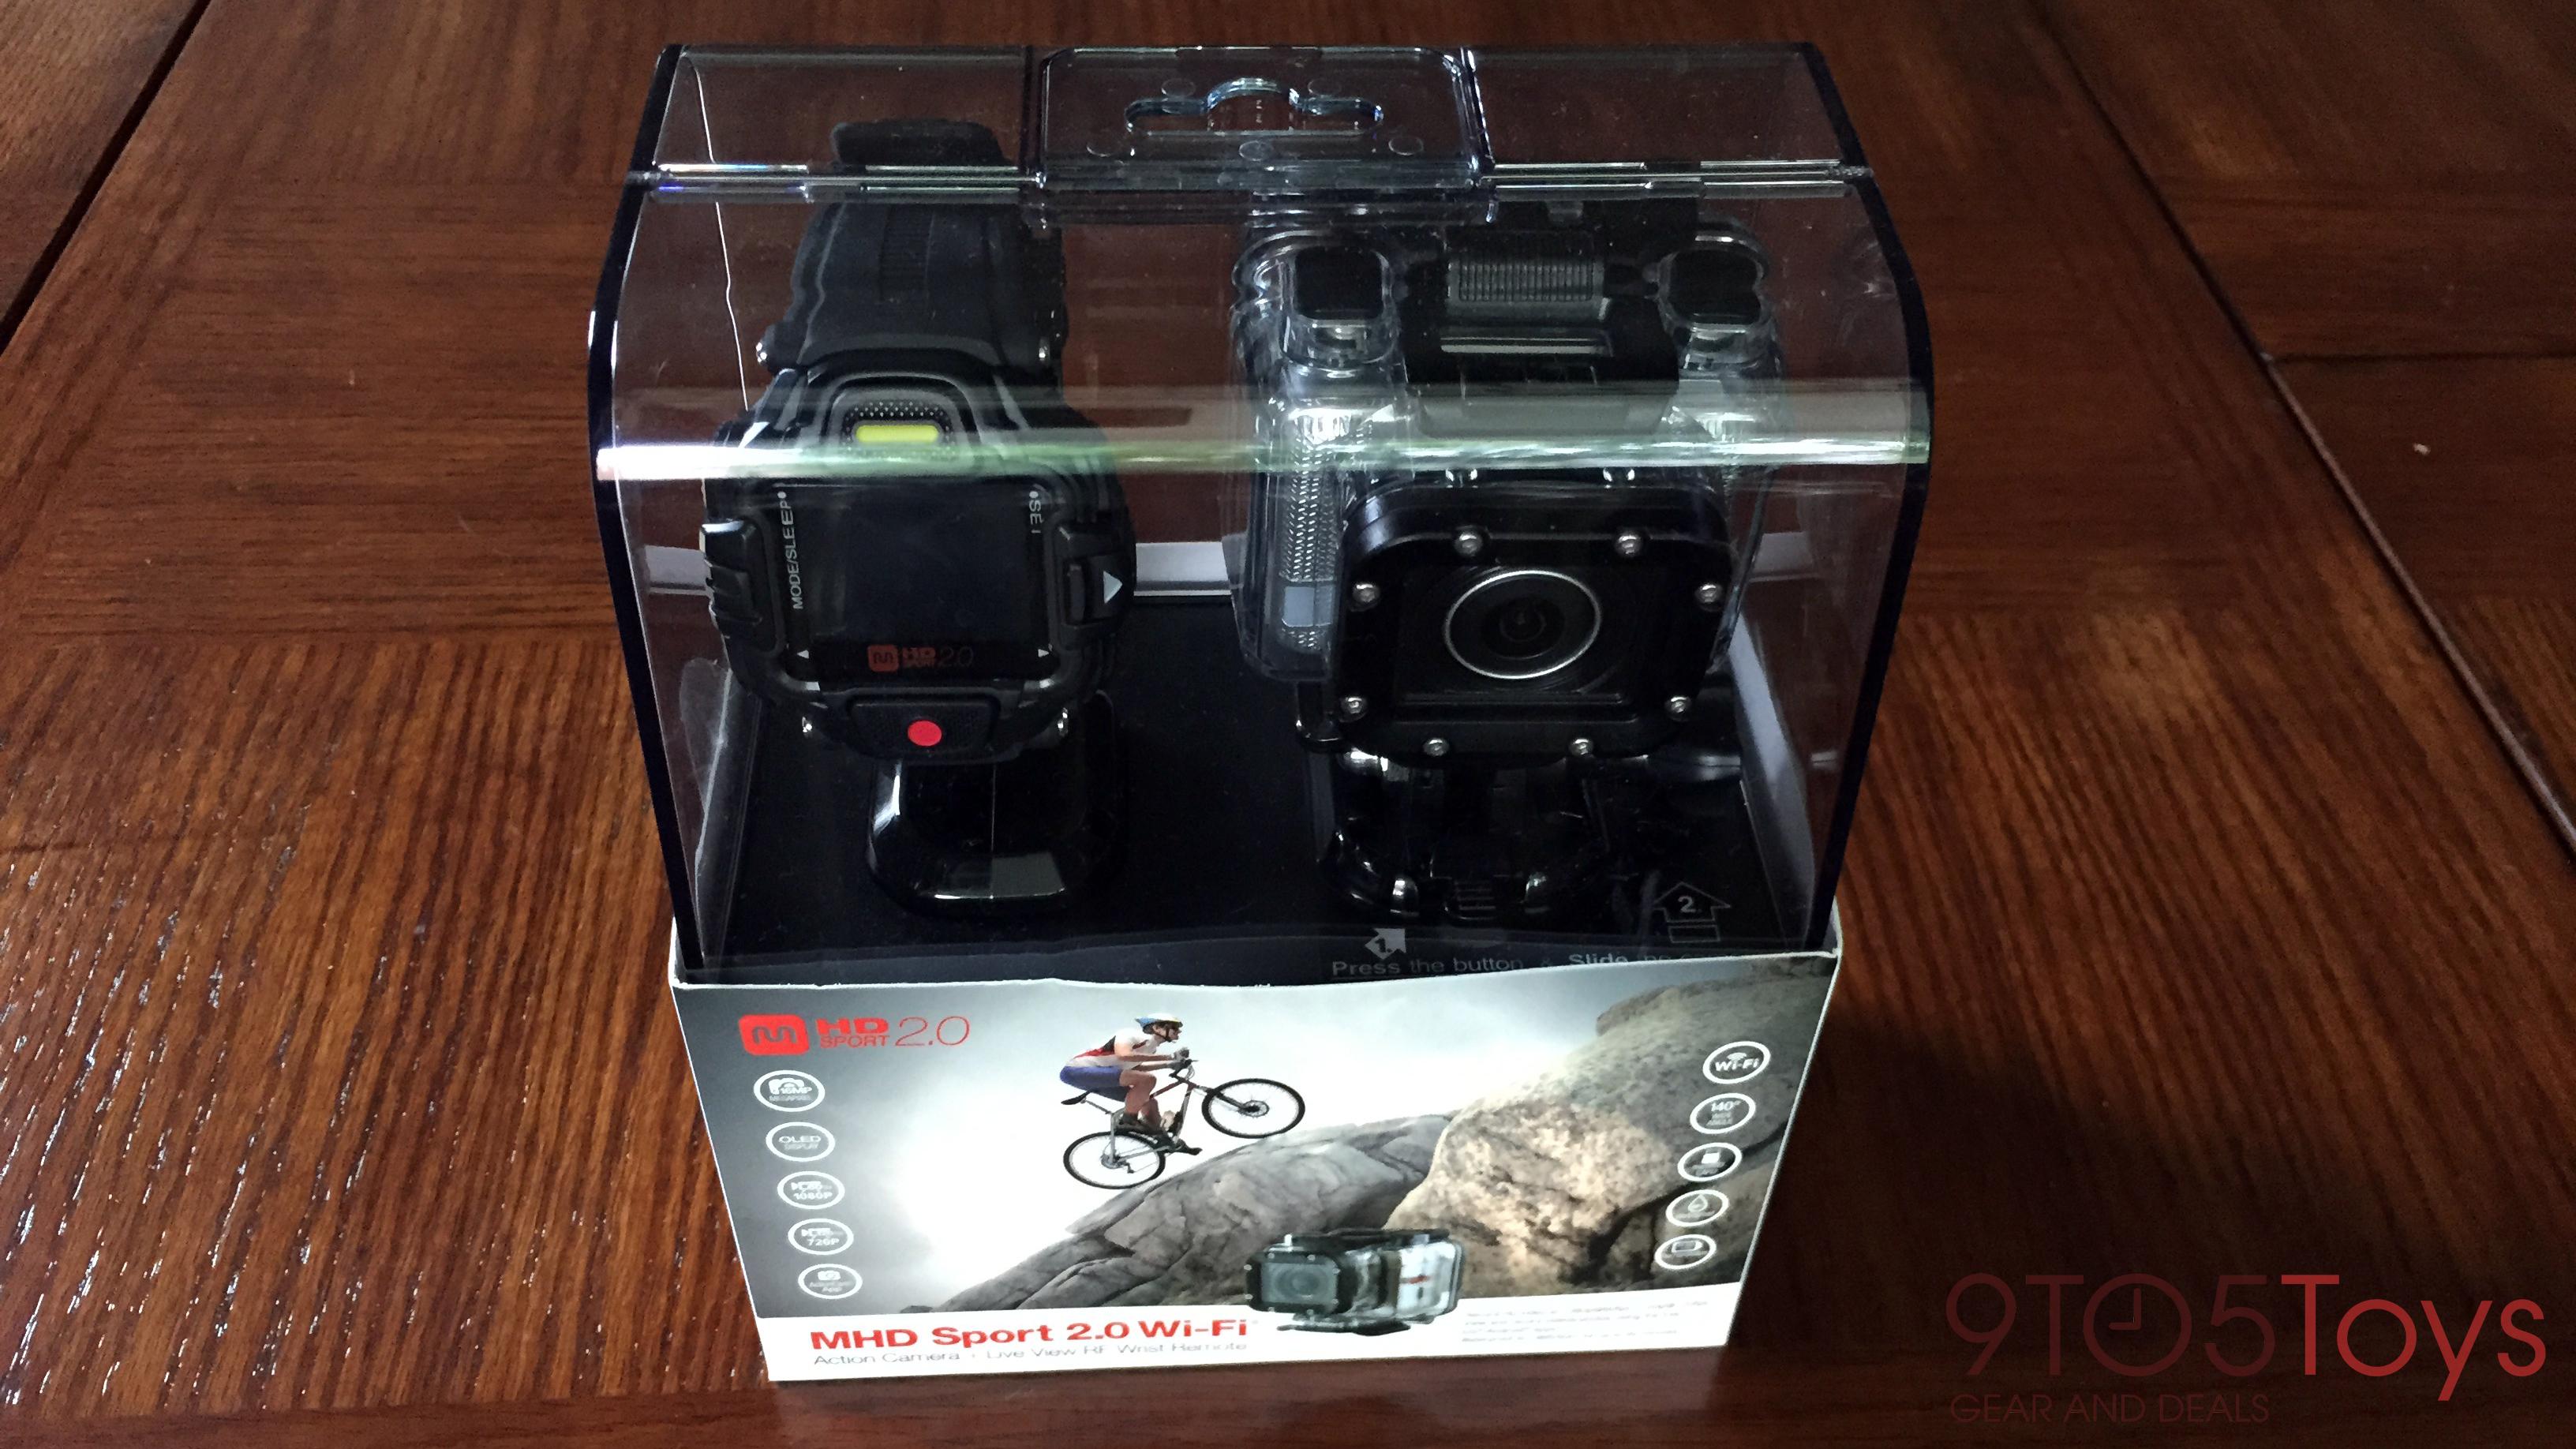 monoprice-action-camera-box-9to5toys